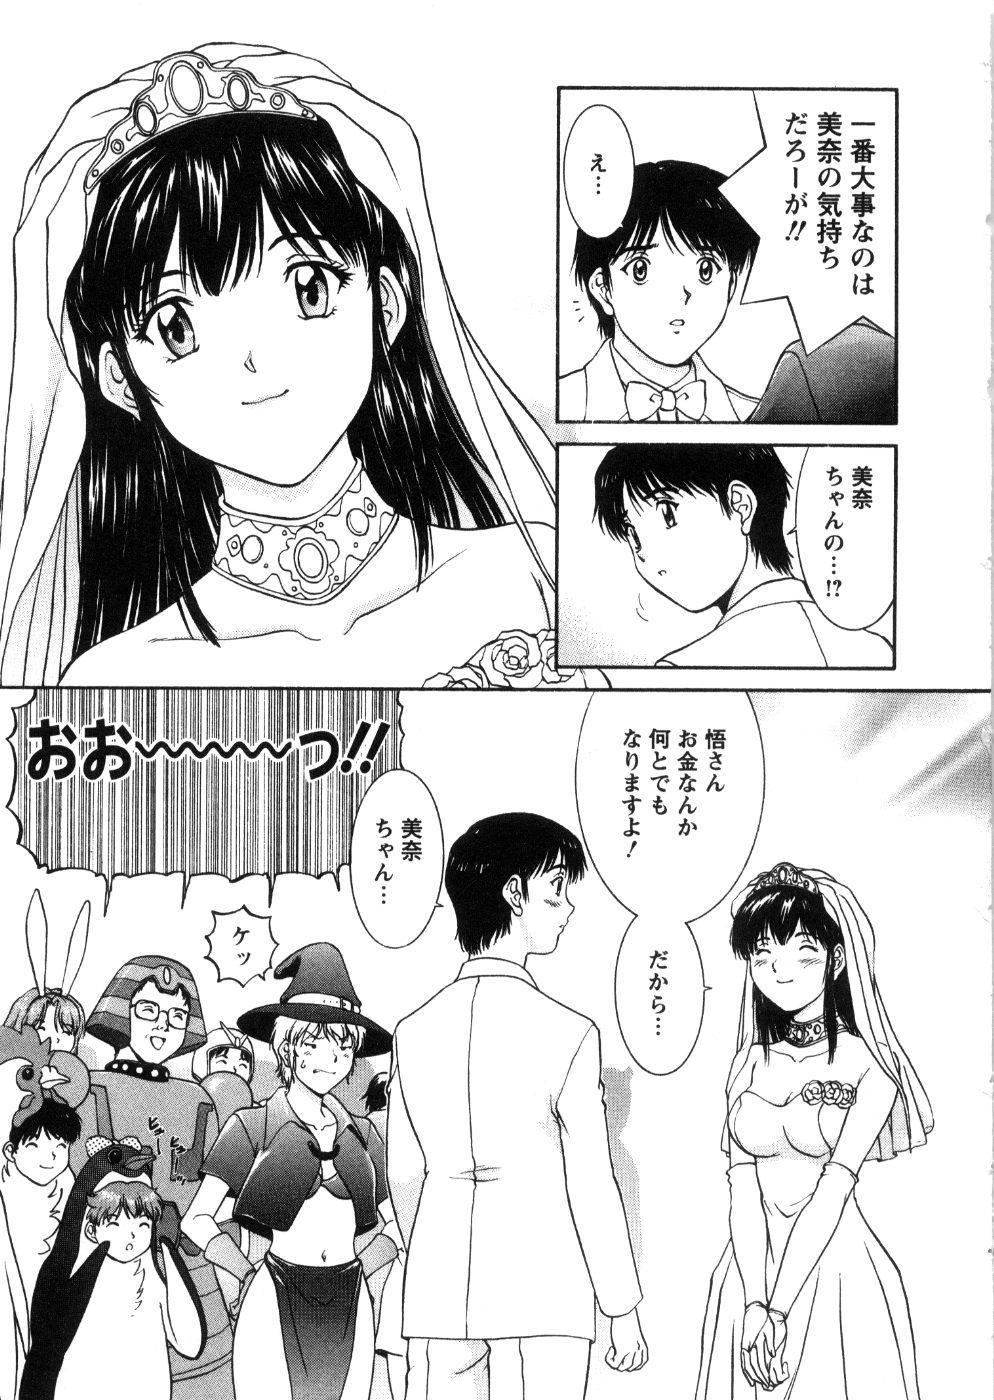 Oneechan-tachi ga Yatte Kuru 03 182